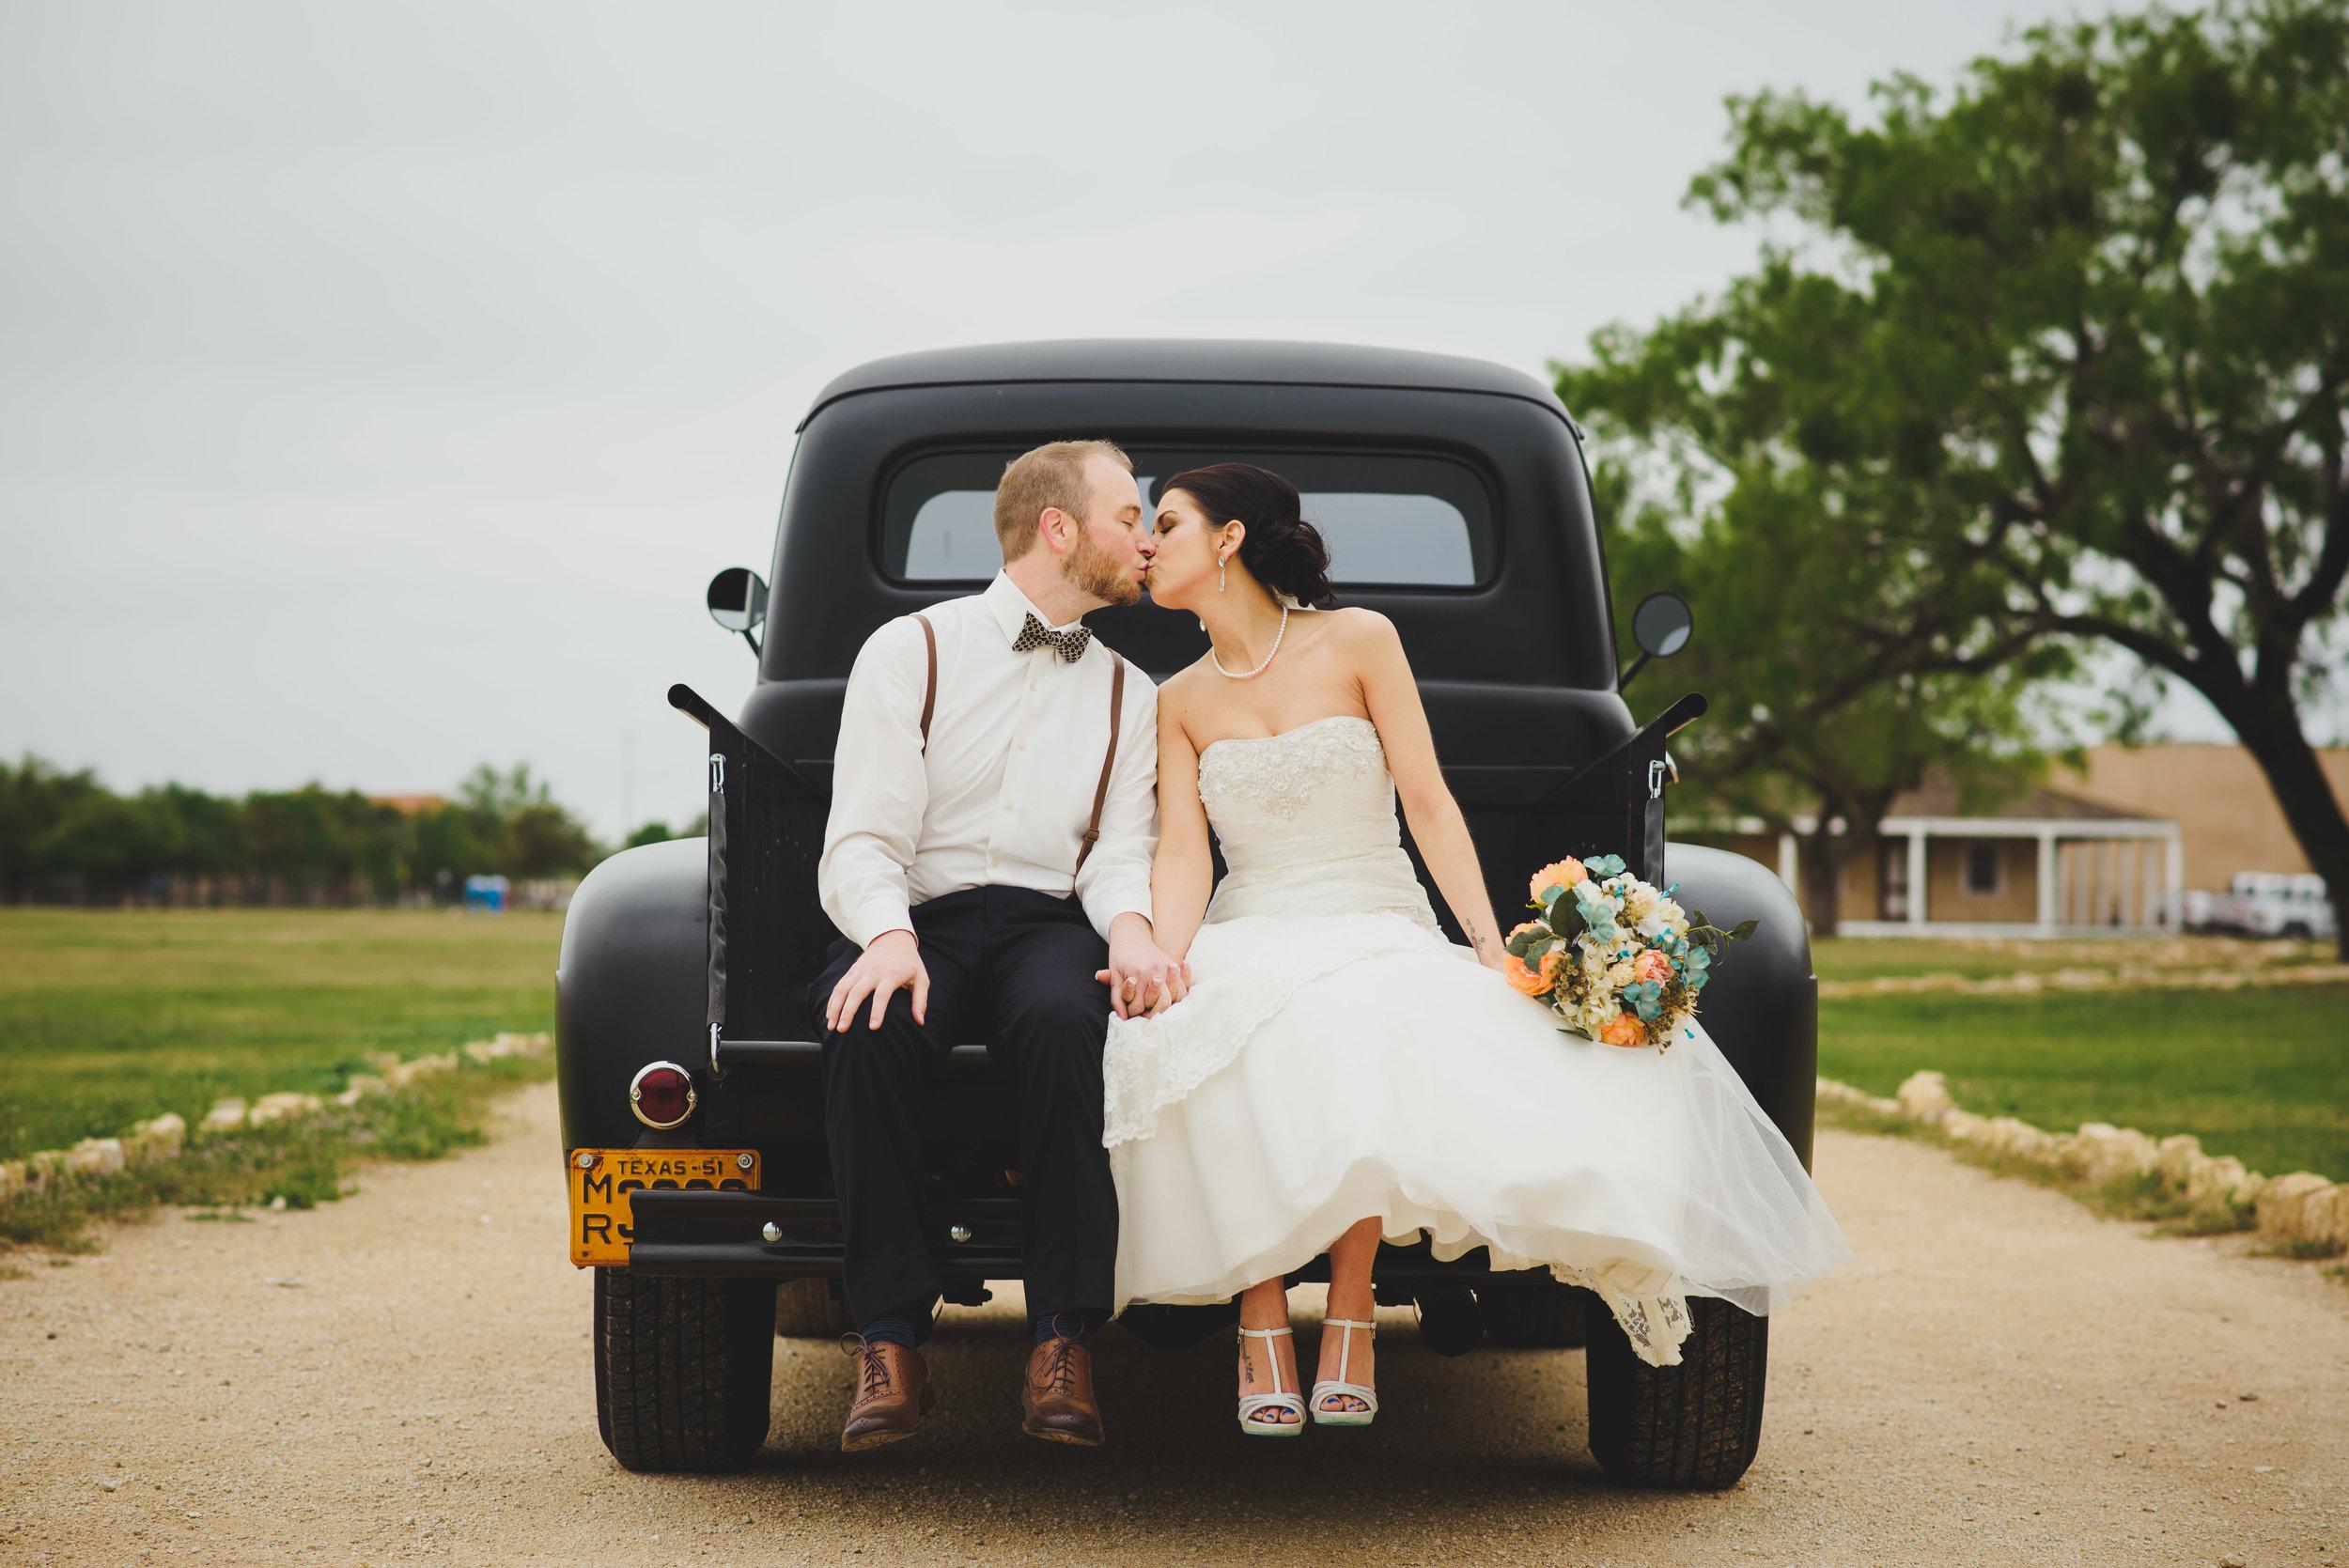 Fort-Concho-San-Angelo-Wedding-Photography-0008.jpg